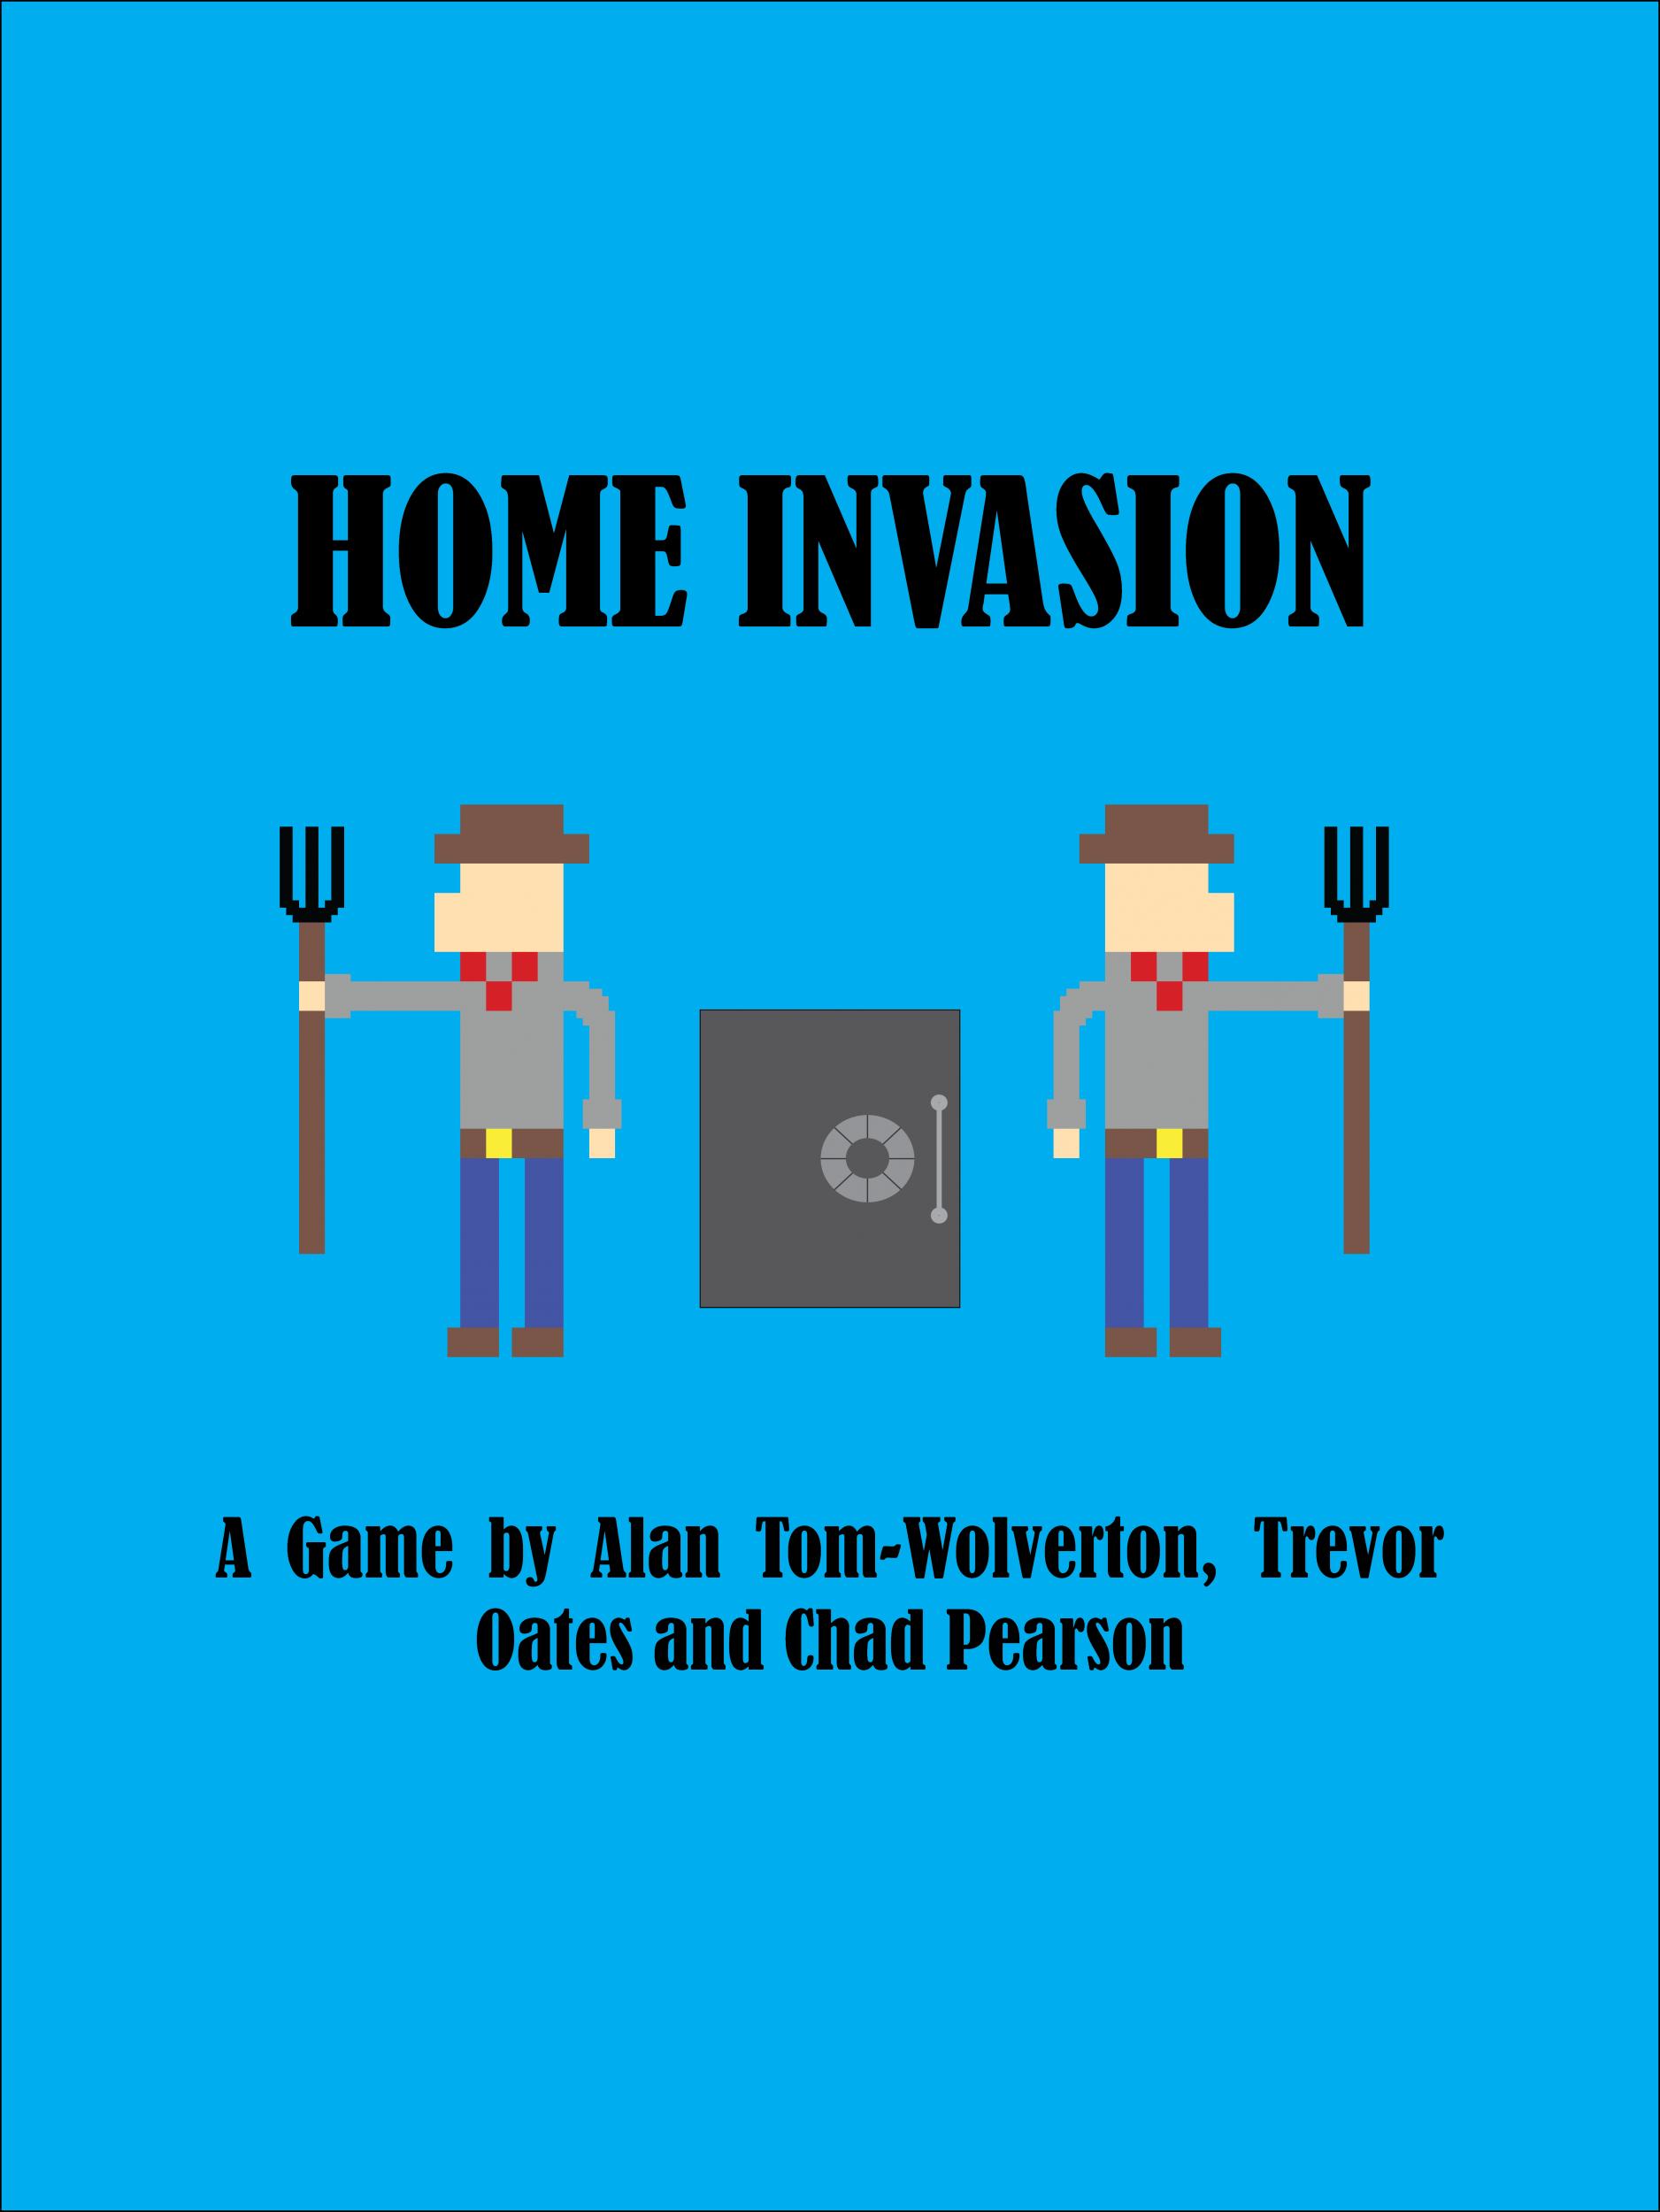 Home Invasion Global Game Jam